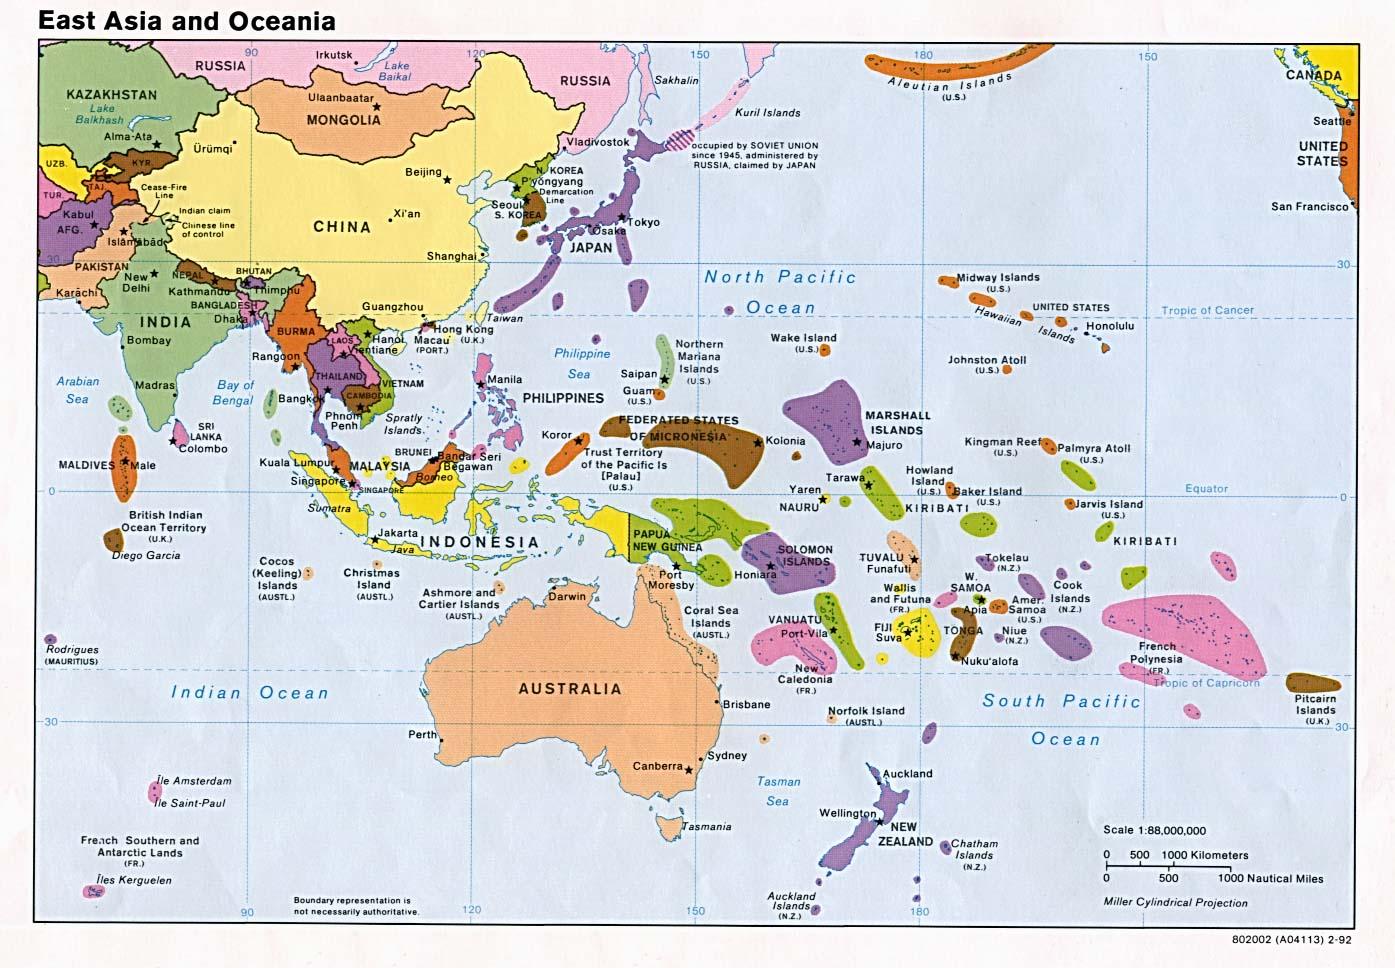 Oceana Divisin Poltica  Ciencia Geogrfica